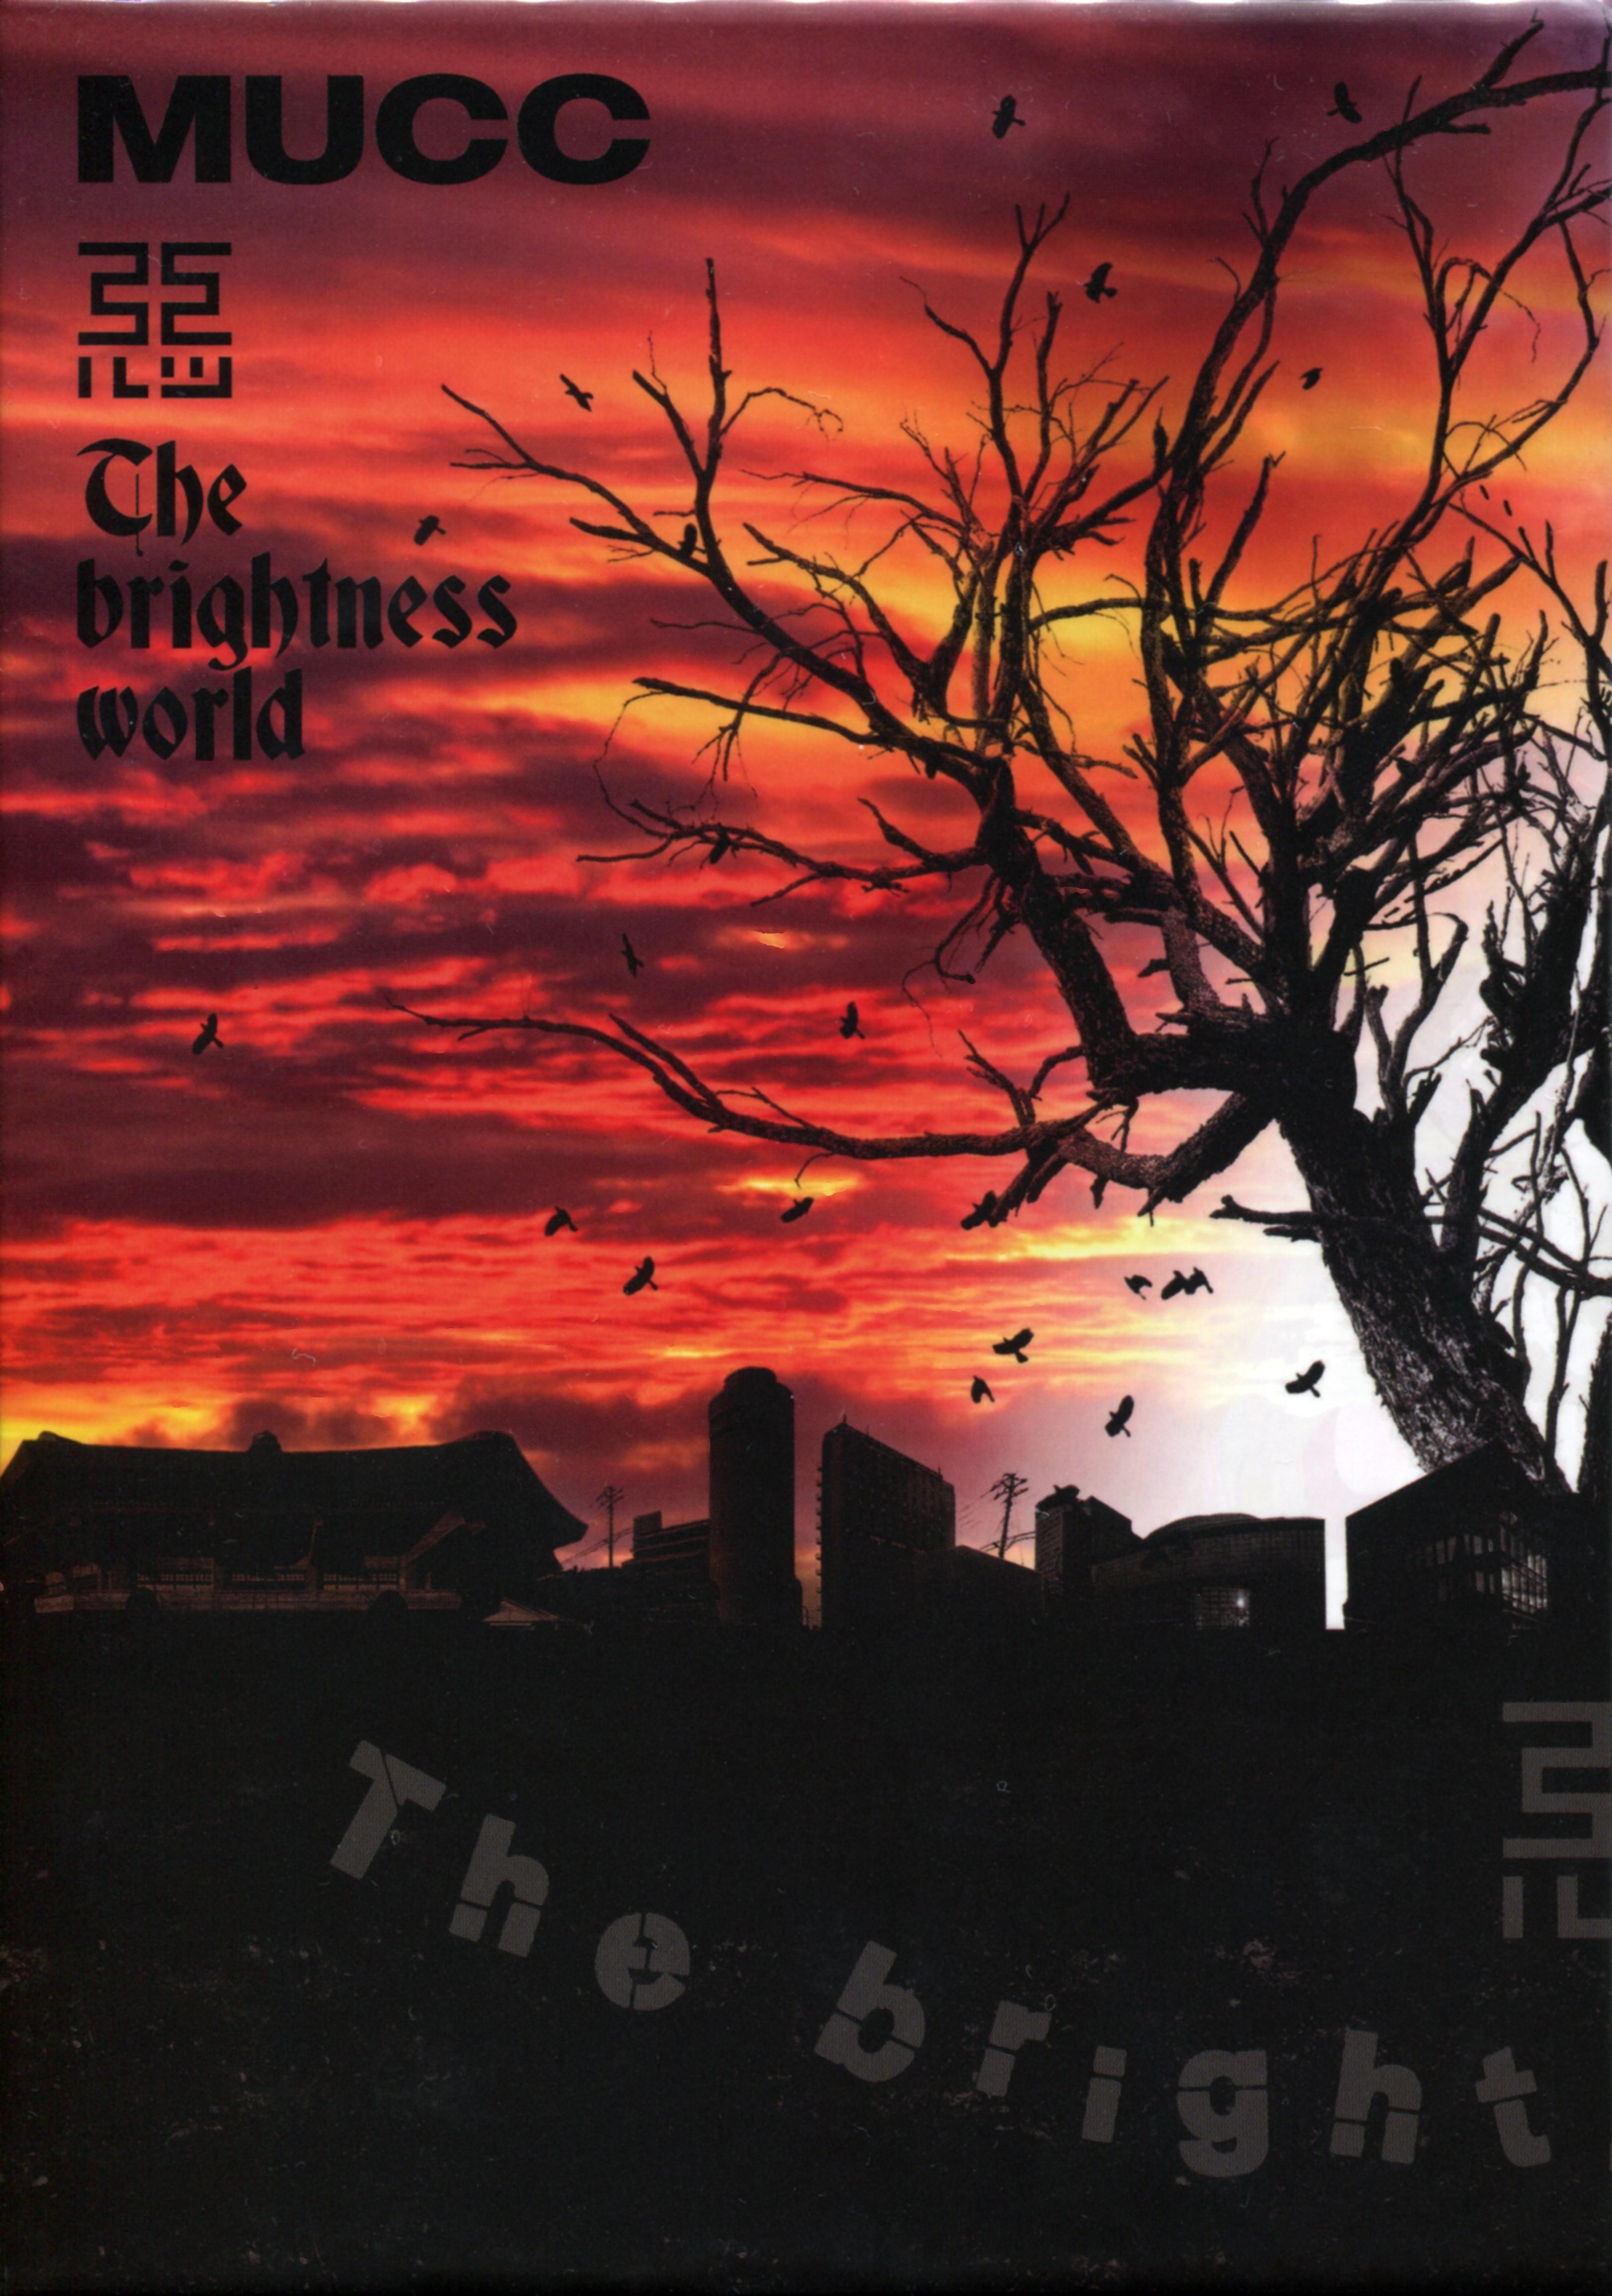 MUCC – 惡-The brightness world [FLAC + MP3 320 + Blu-ray ISO] [2021.06.09]